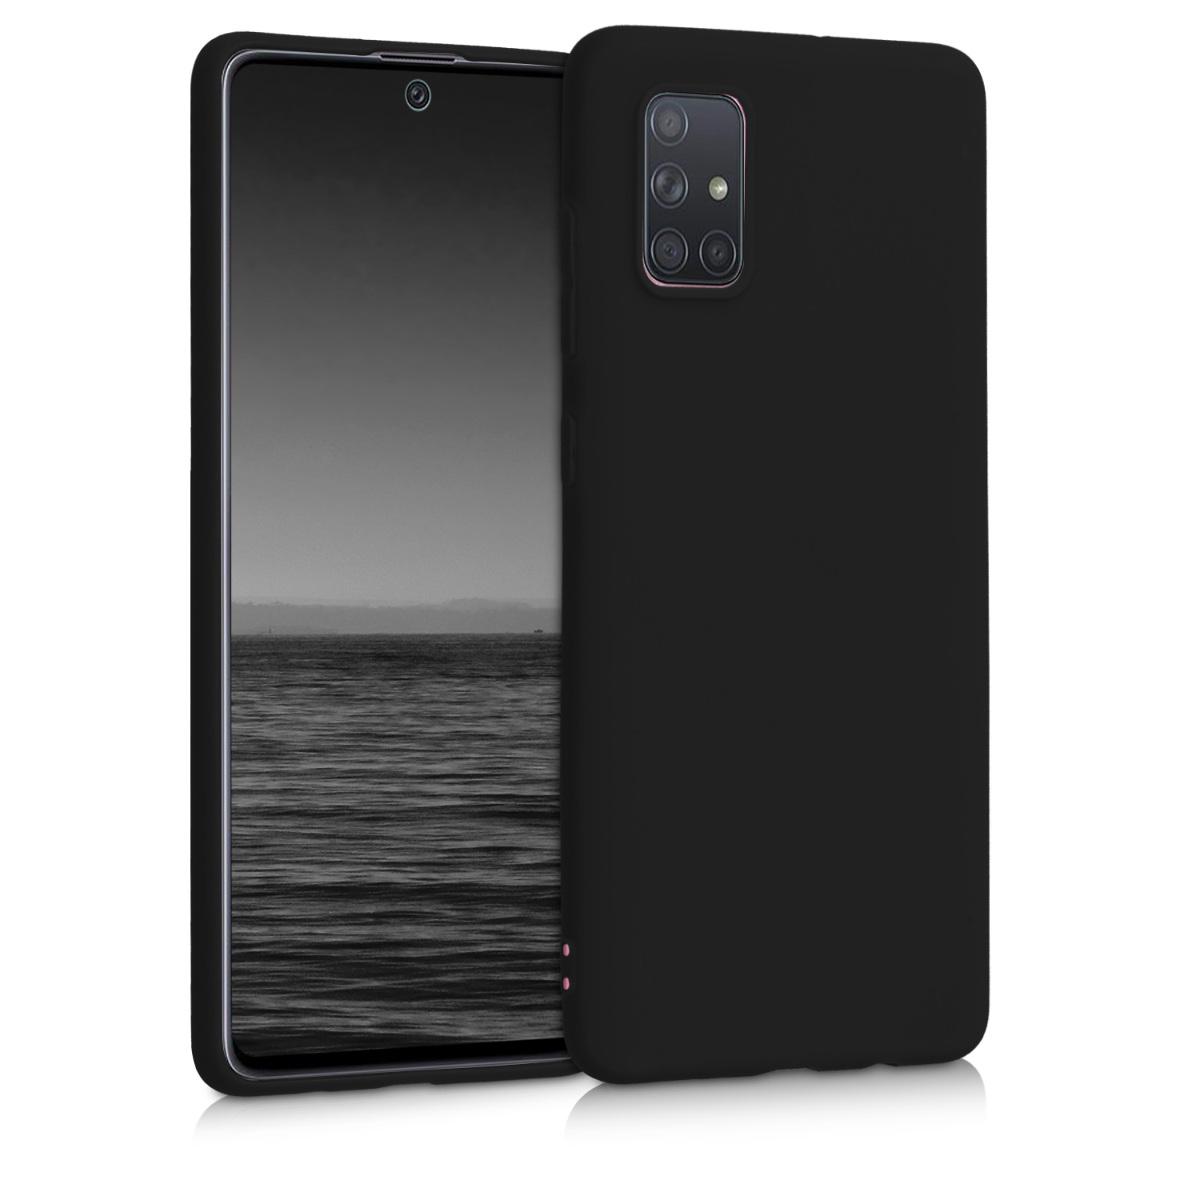 KW Θήκη Σιλικόνης Samsung Galaxy A71 - Black Matte (51208.47)